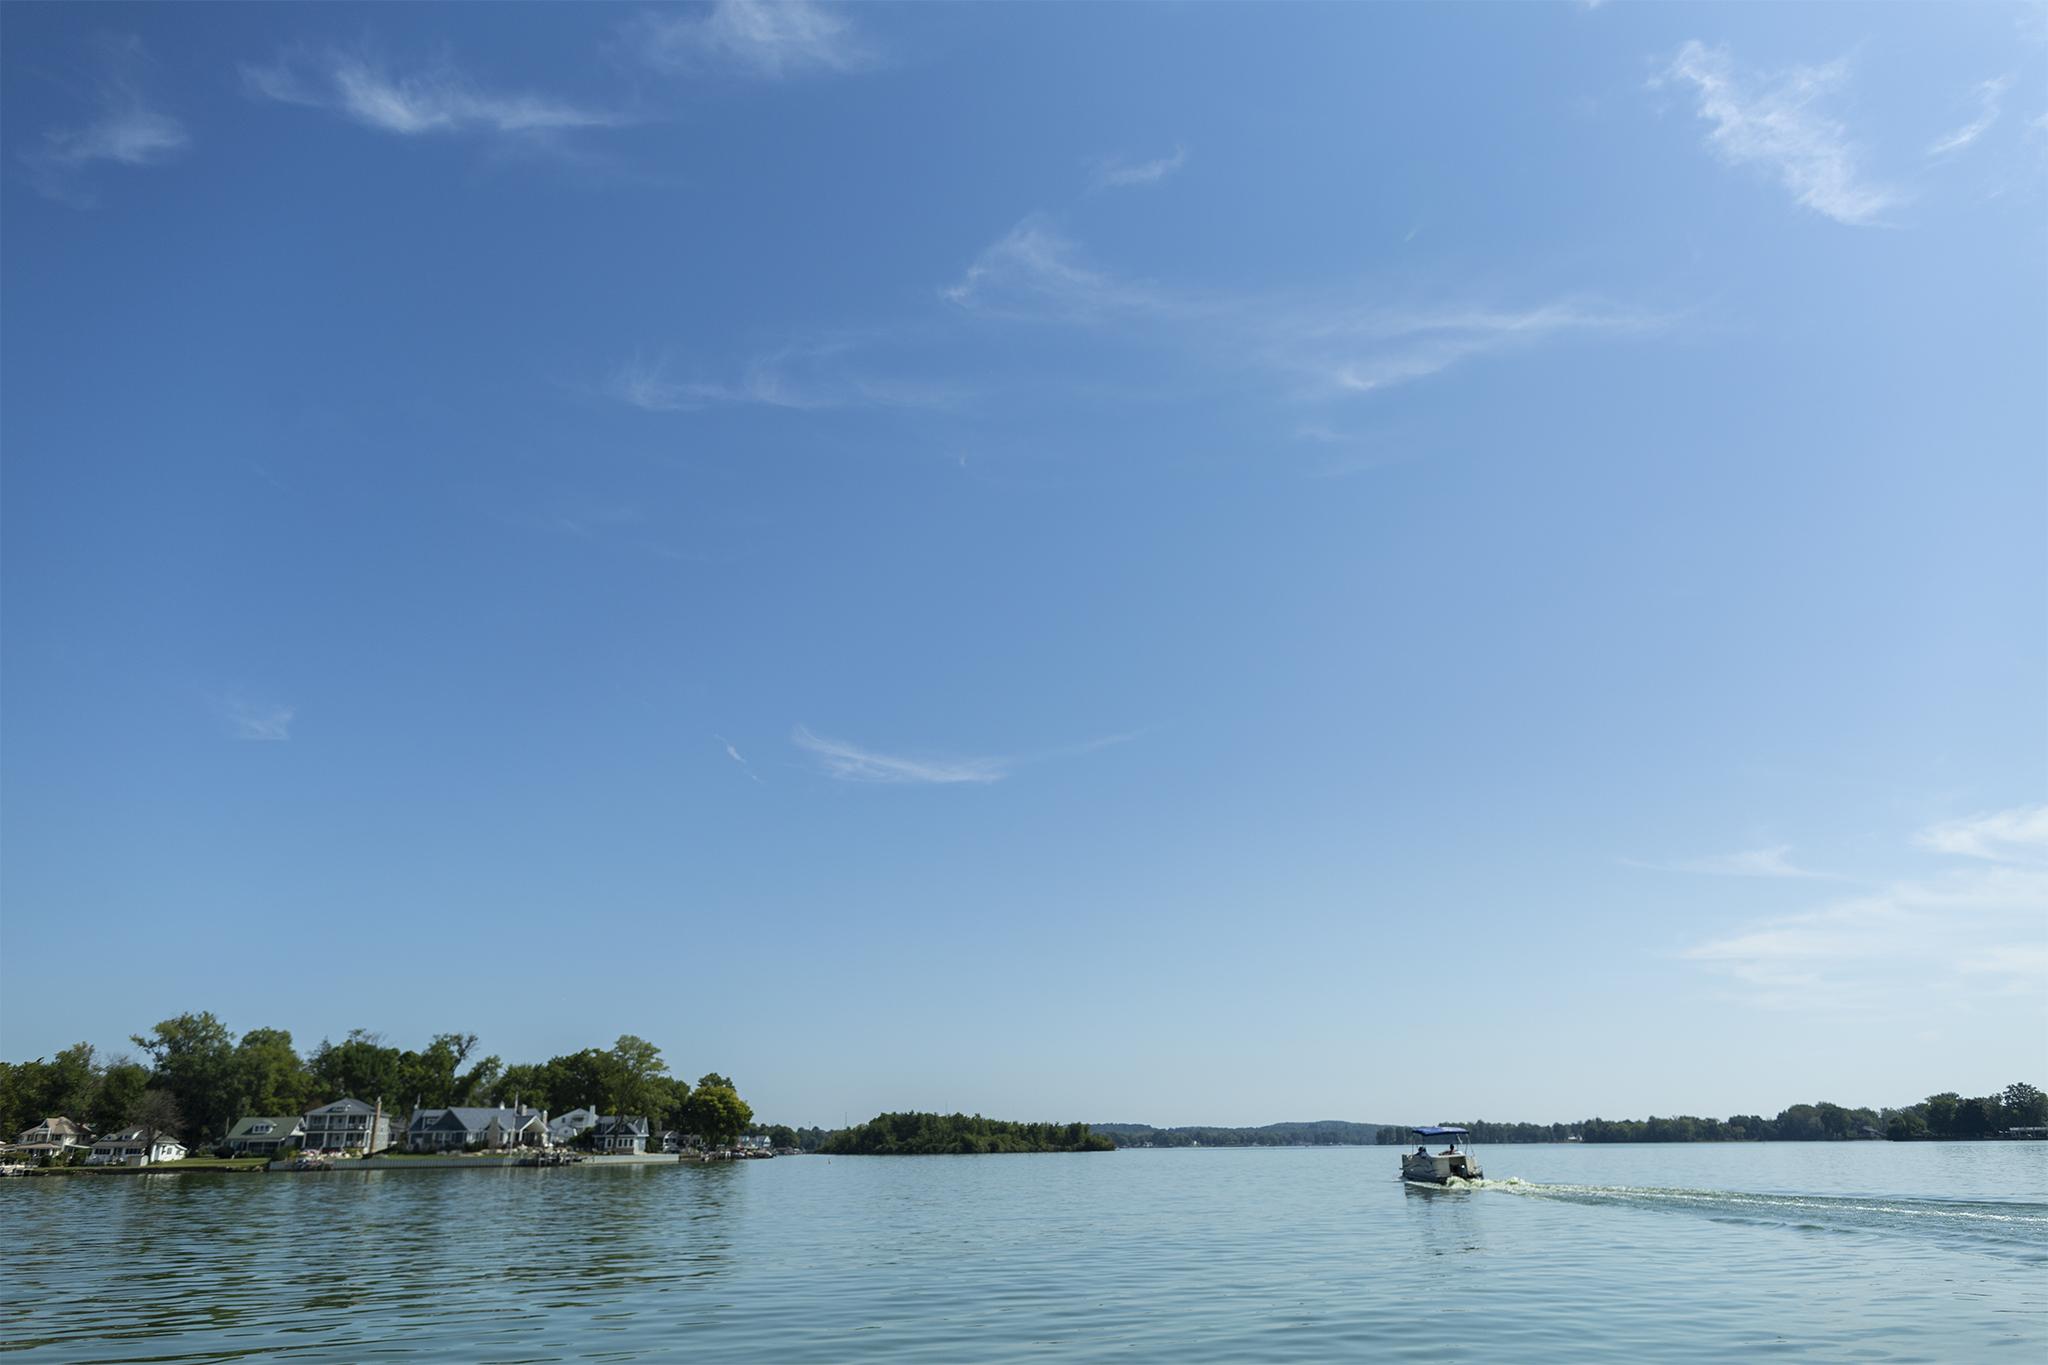 Buckeye_Lake_Boat.jpg